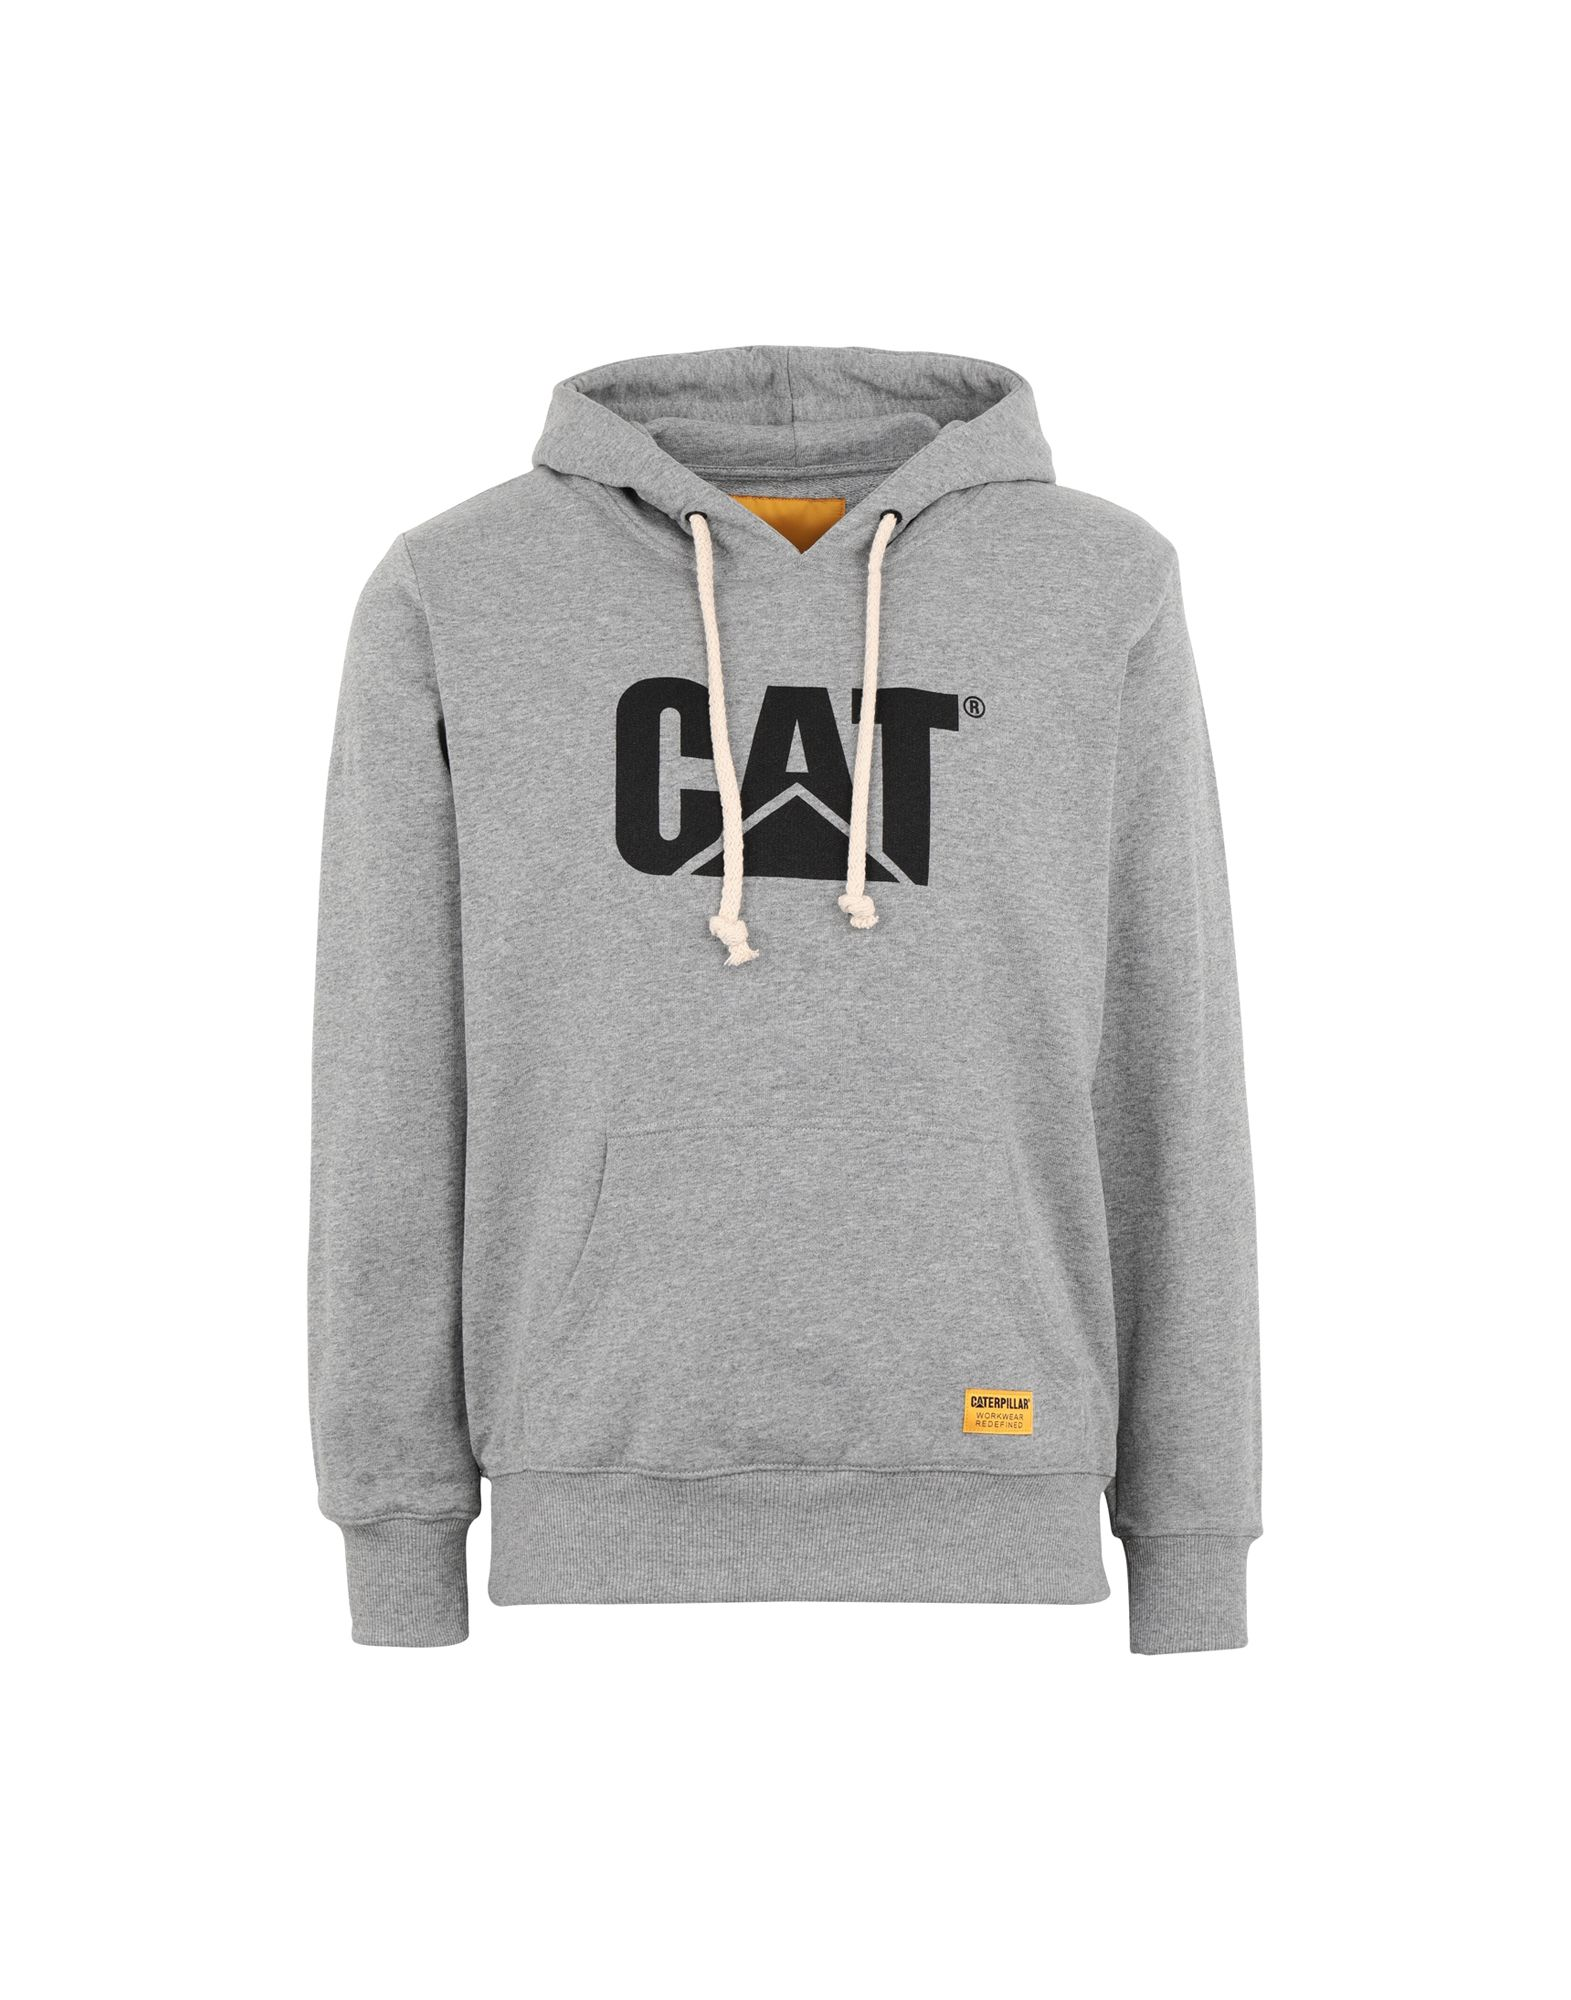 taglia 40 5528b 26cb6 Felpa Caterpillar Cat Hoodie - Uomo - Acquista online su ...